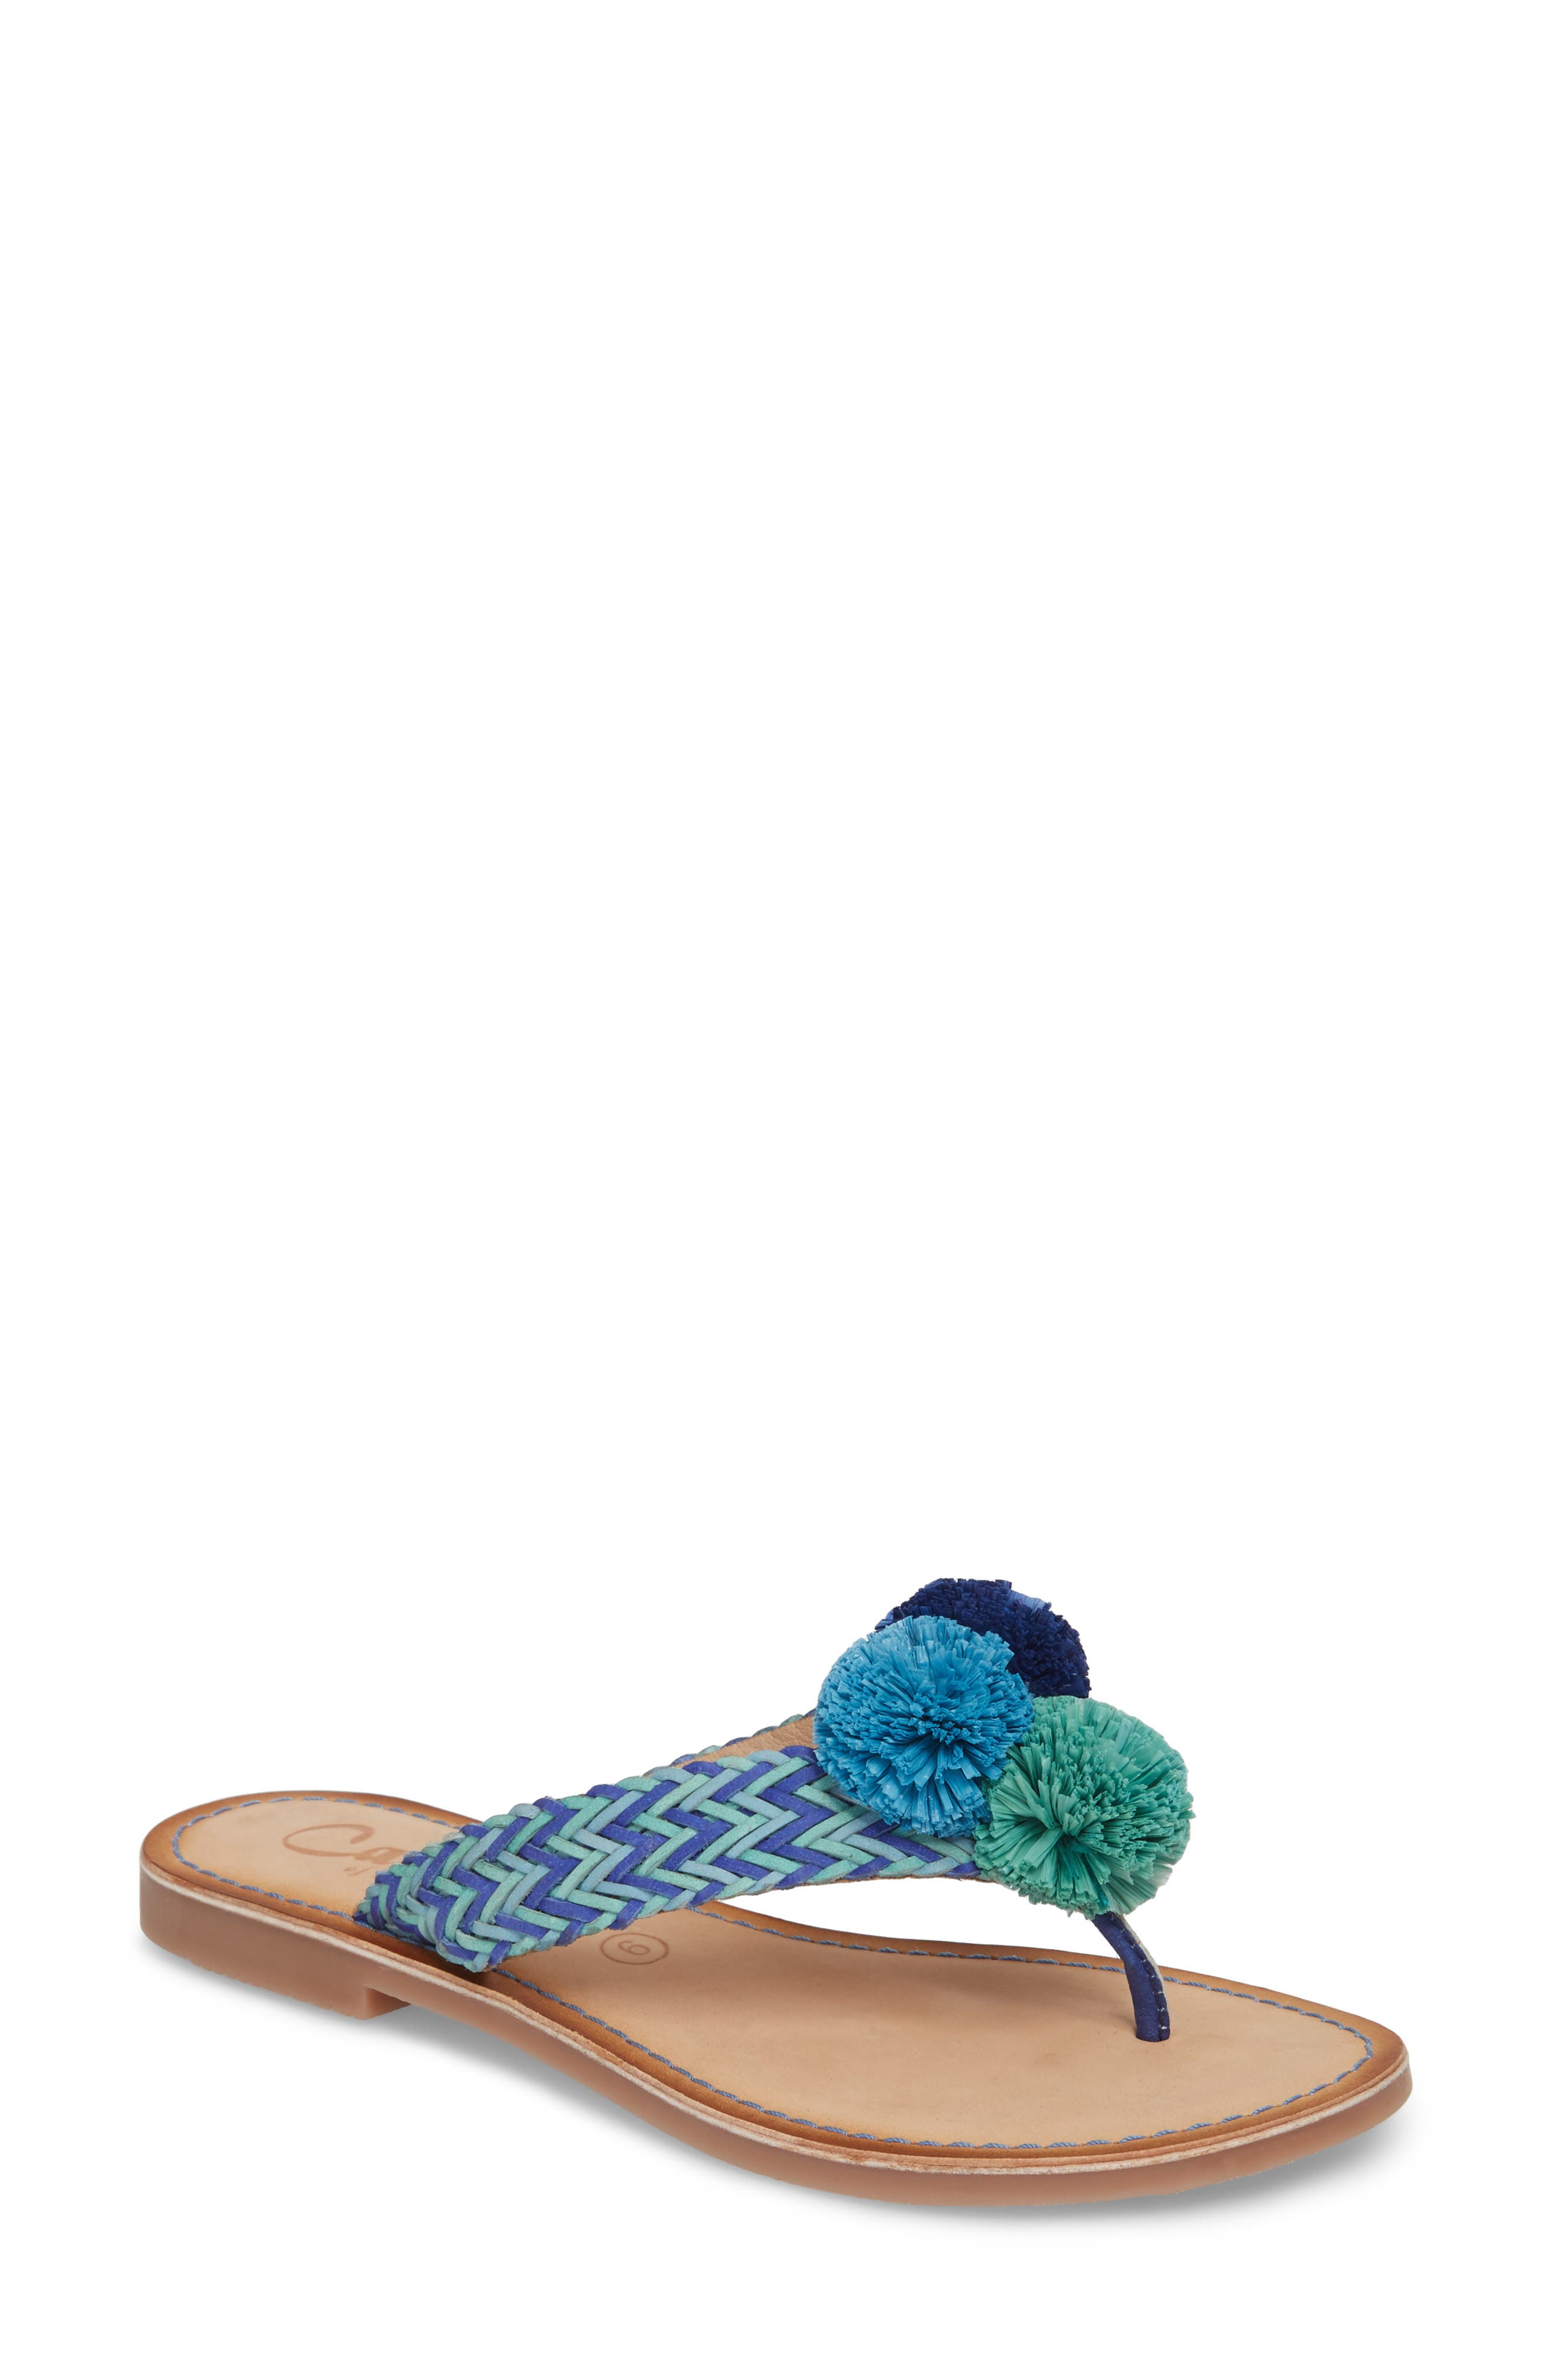 Pomm Flip Flop,                         Main,                         color, Blue Leather